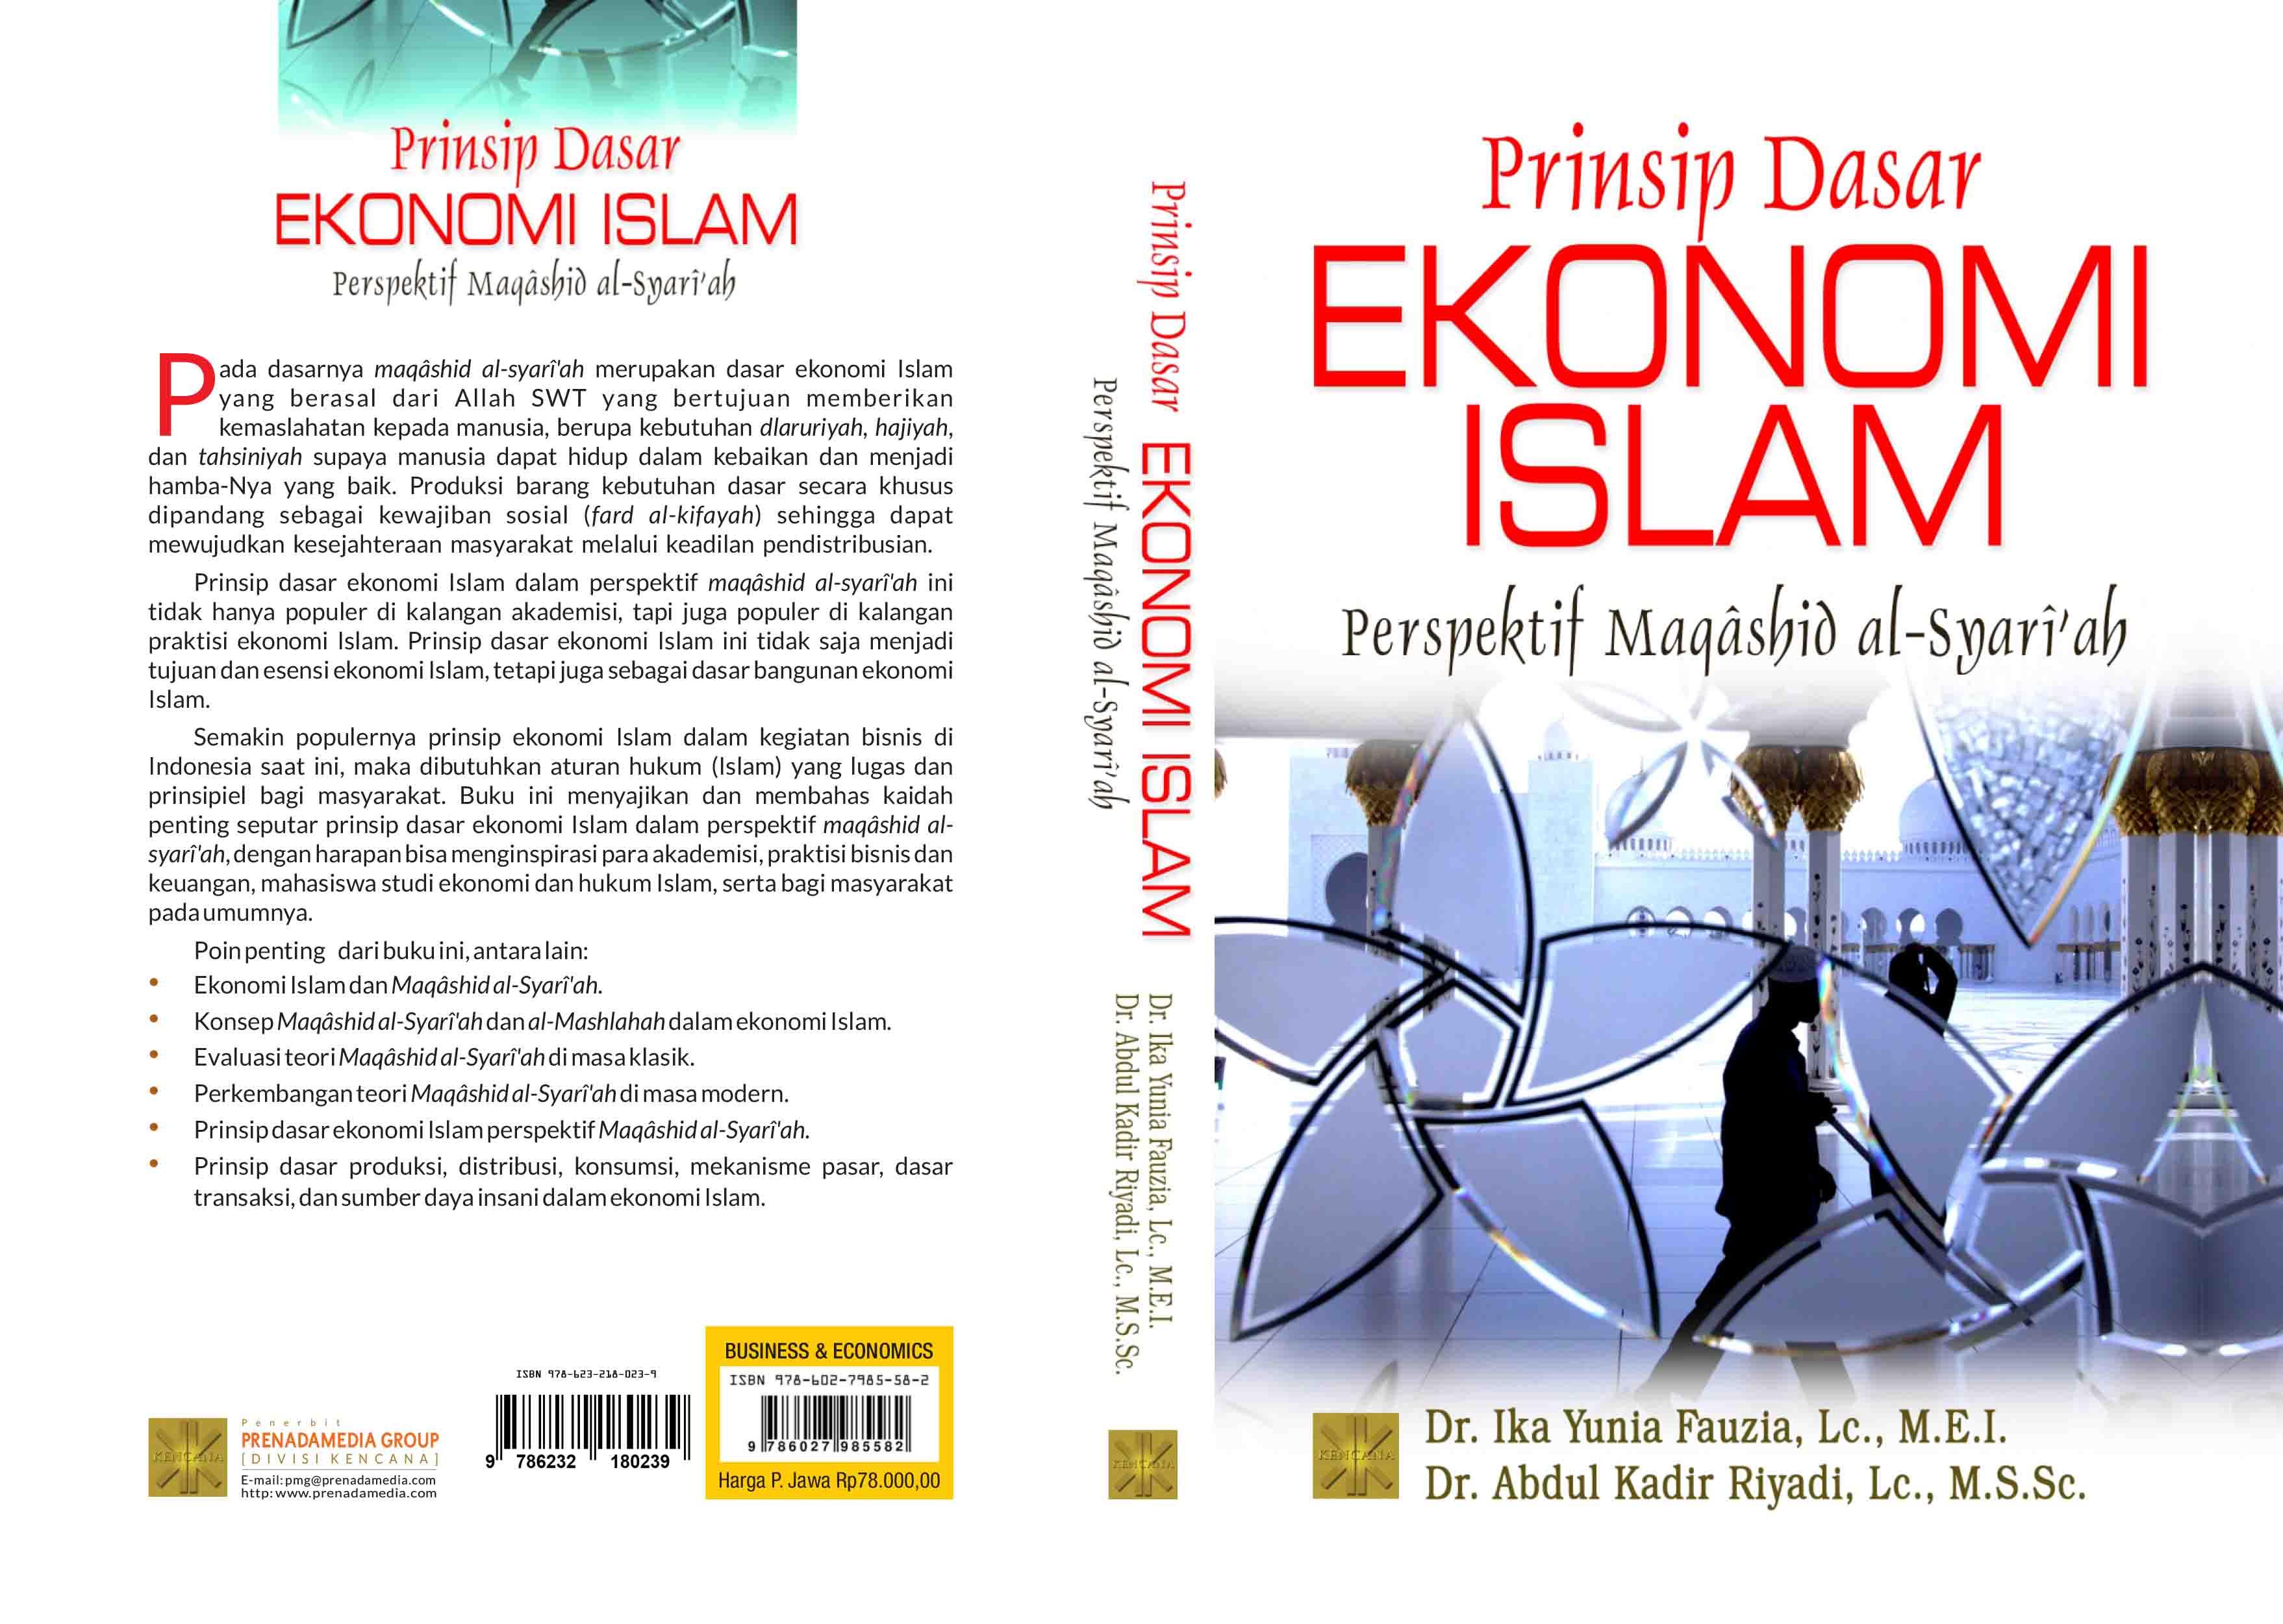 Prinsip dasar ekonomi Islam [sumber elektronis] : perspektif maqashid al-syari'ah